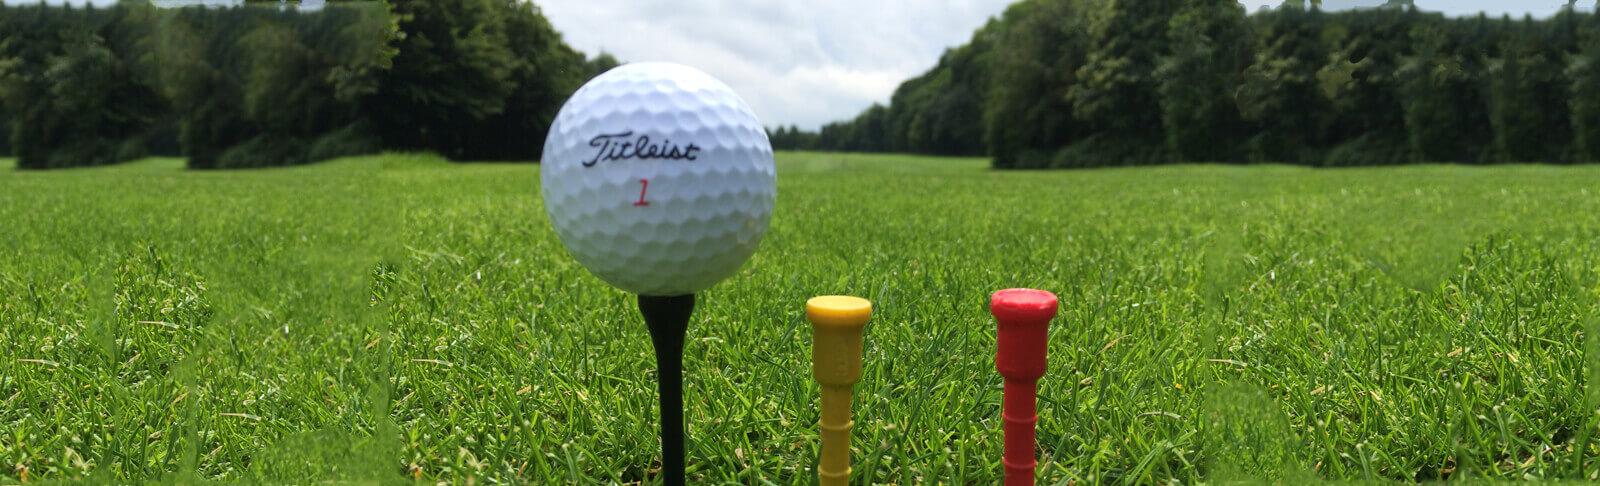 Golfbal op veld